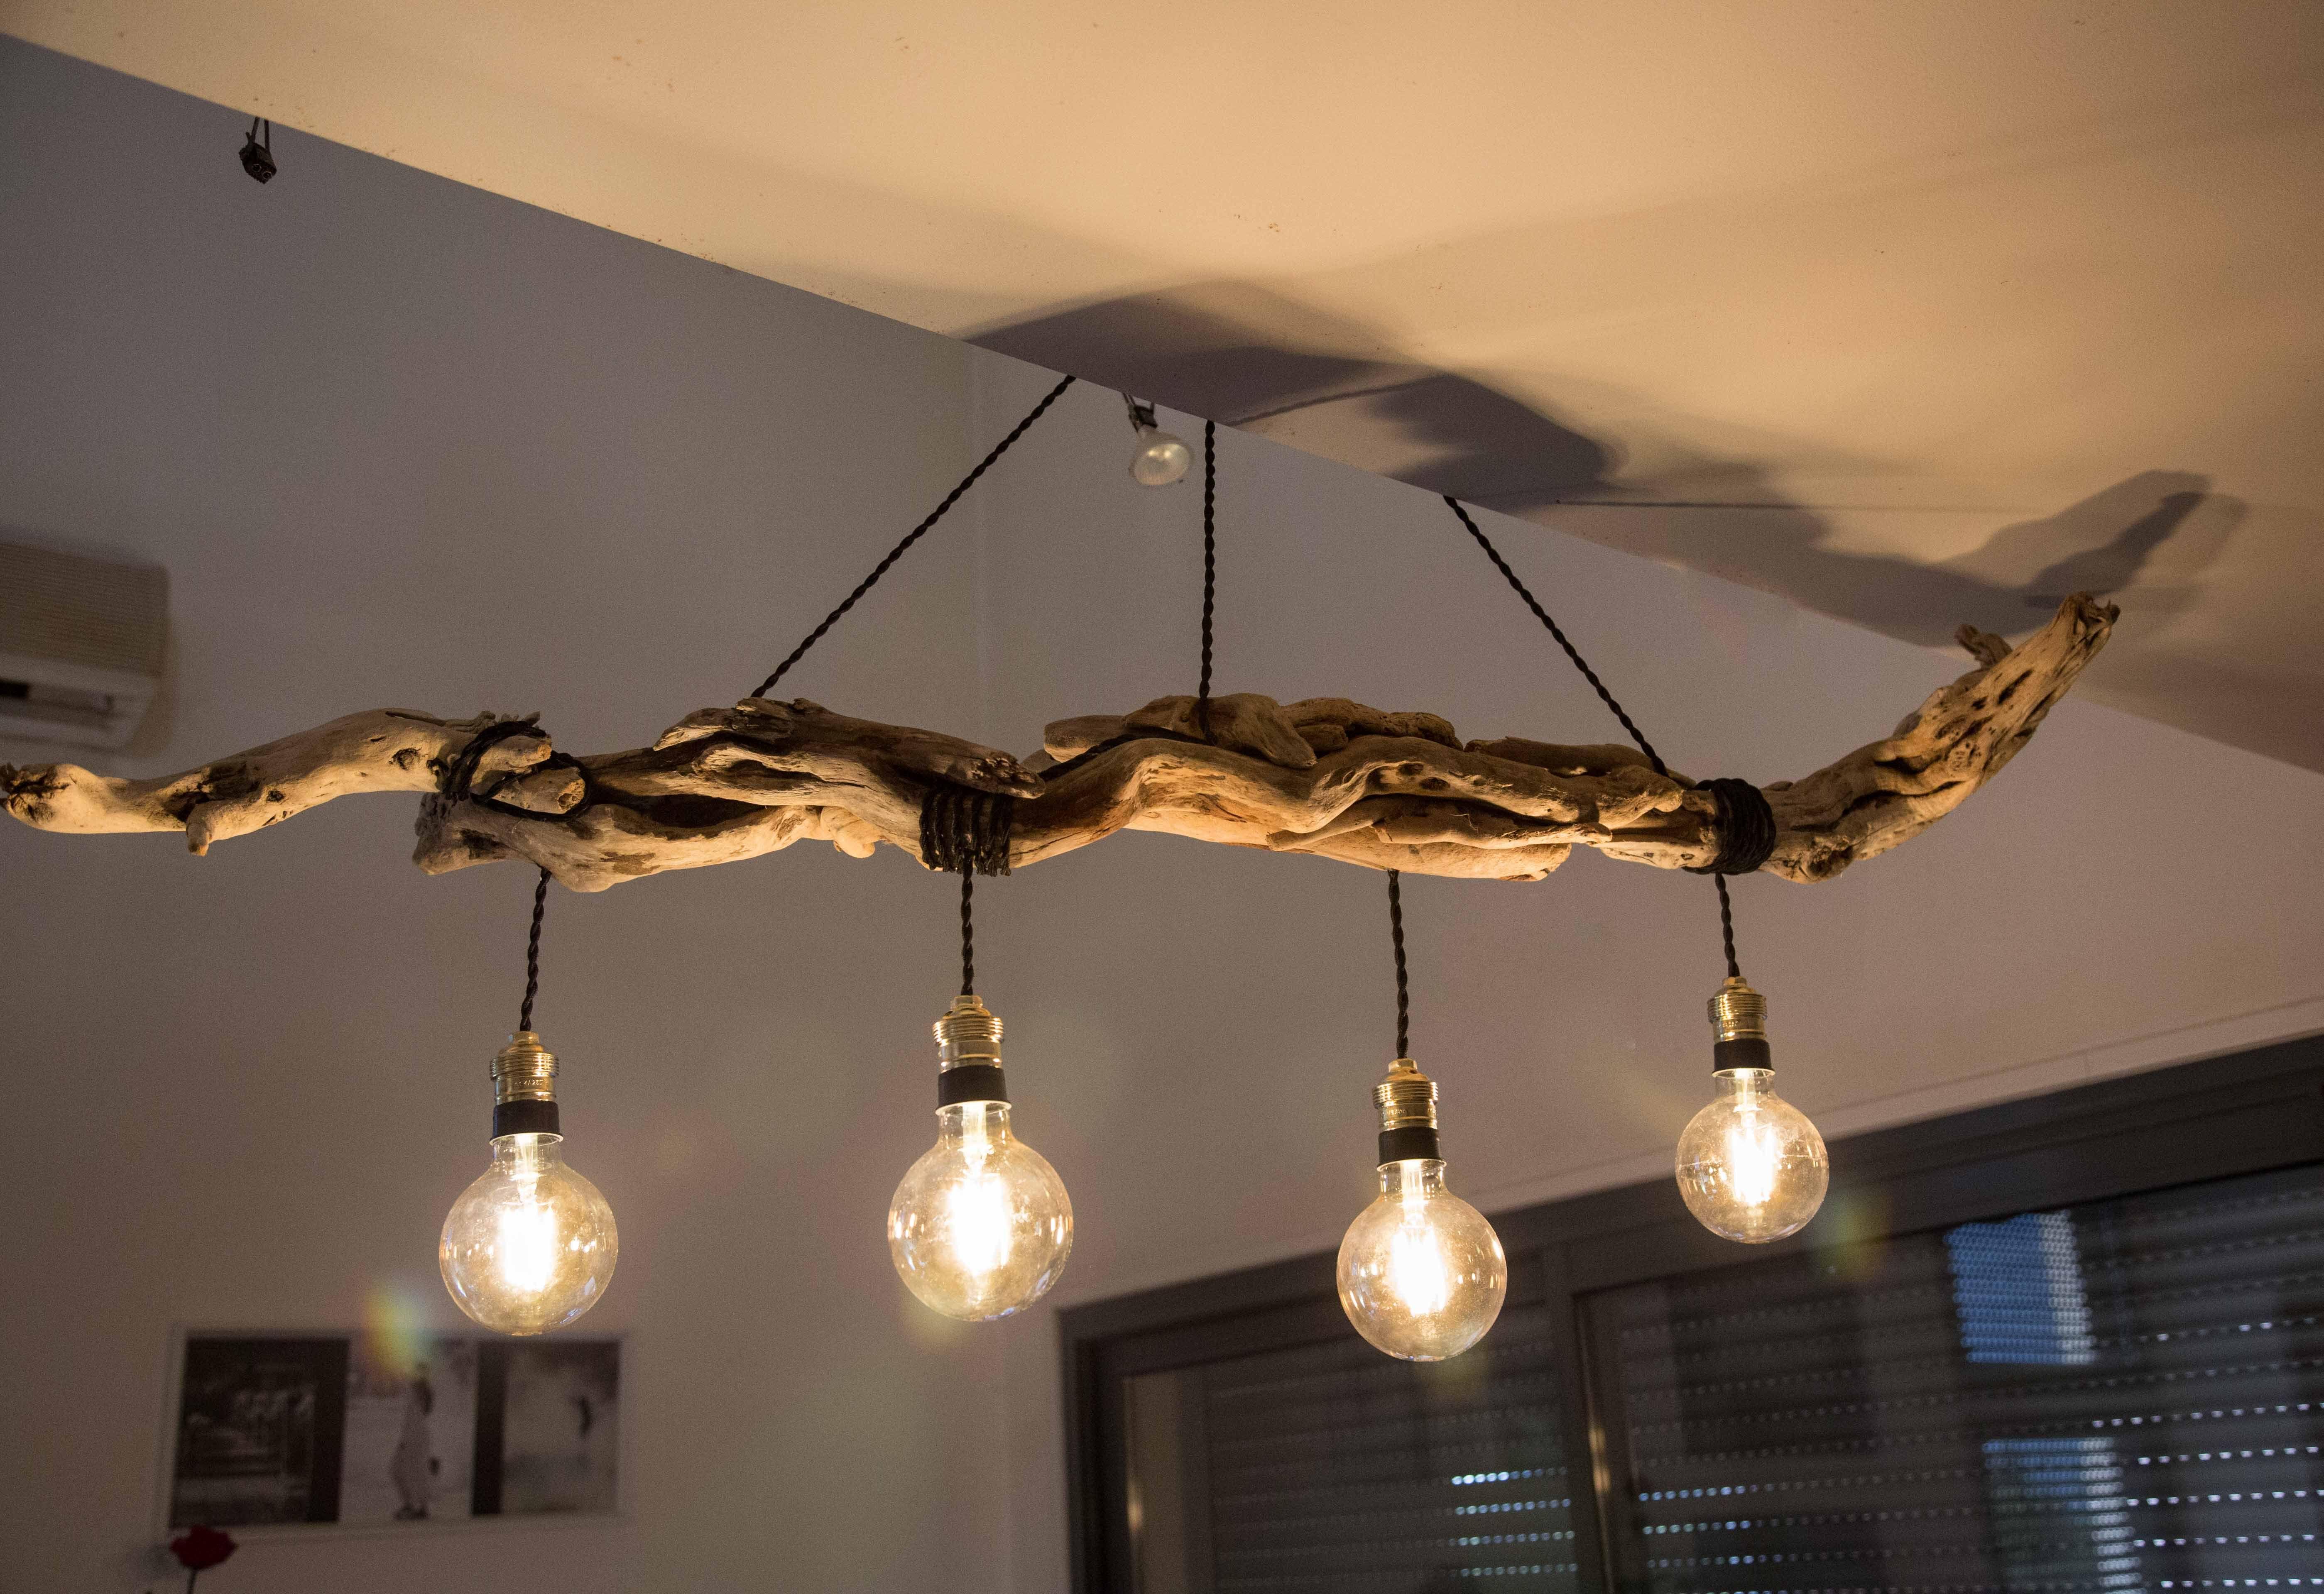 Épinglé sur Ideas de iluminación